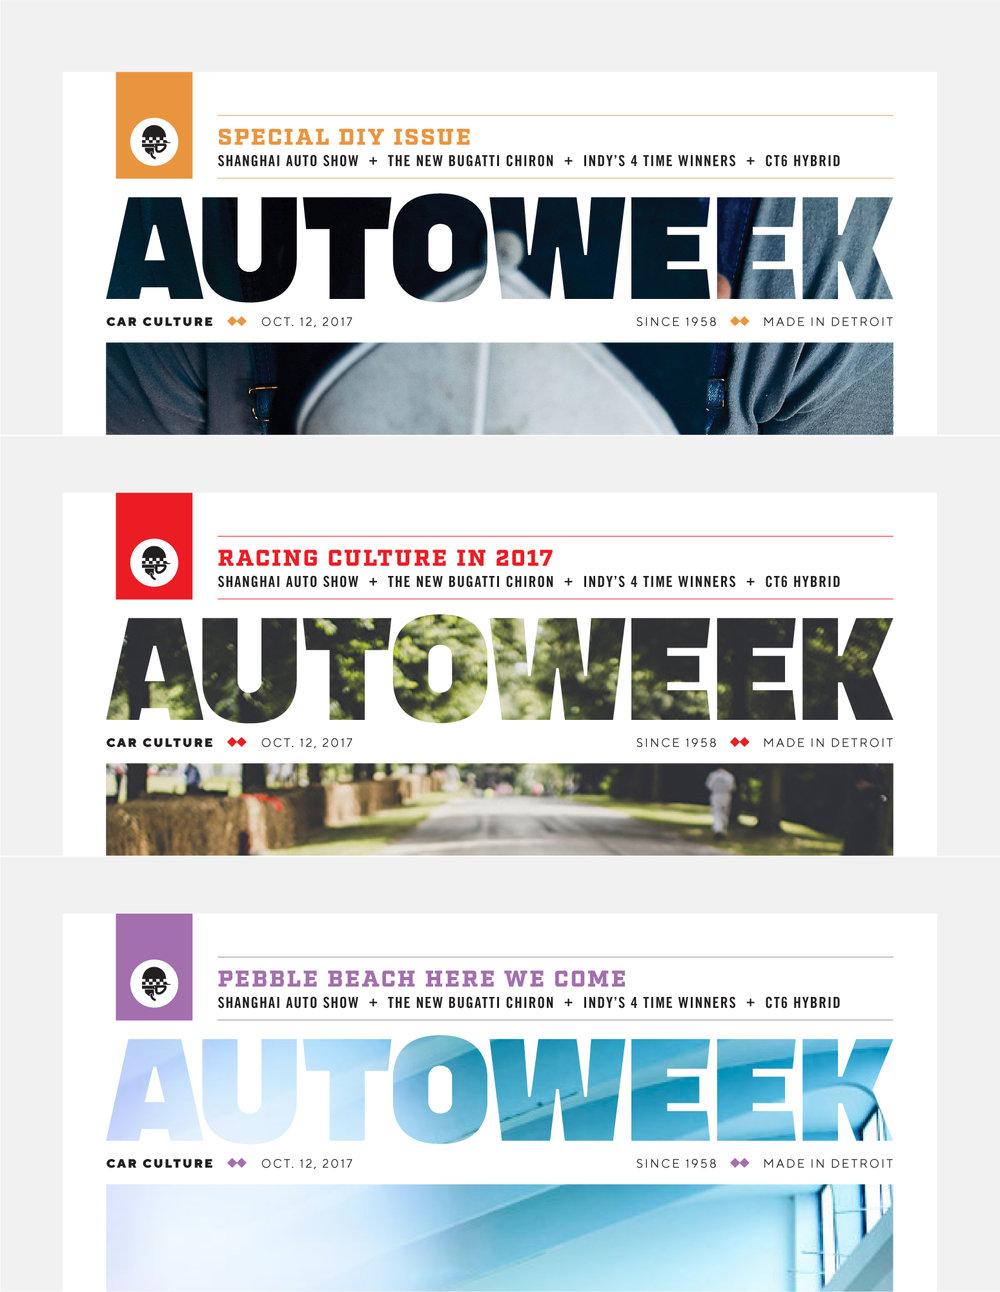 autoweek-masthead-treatment@2x-100.jpg